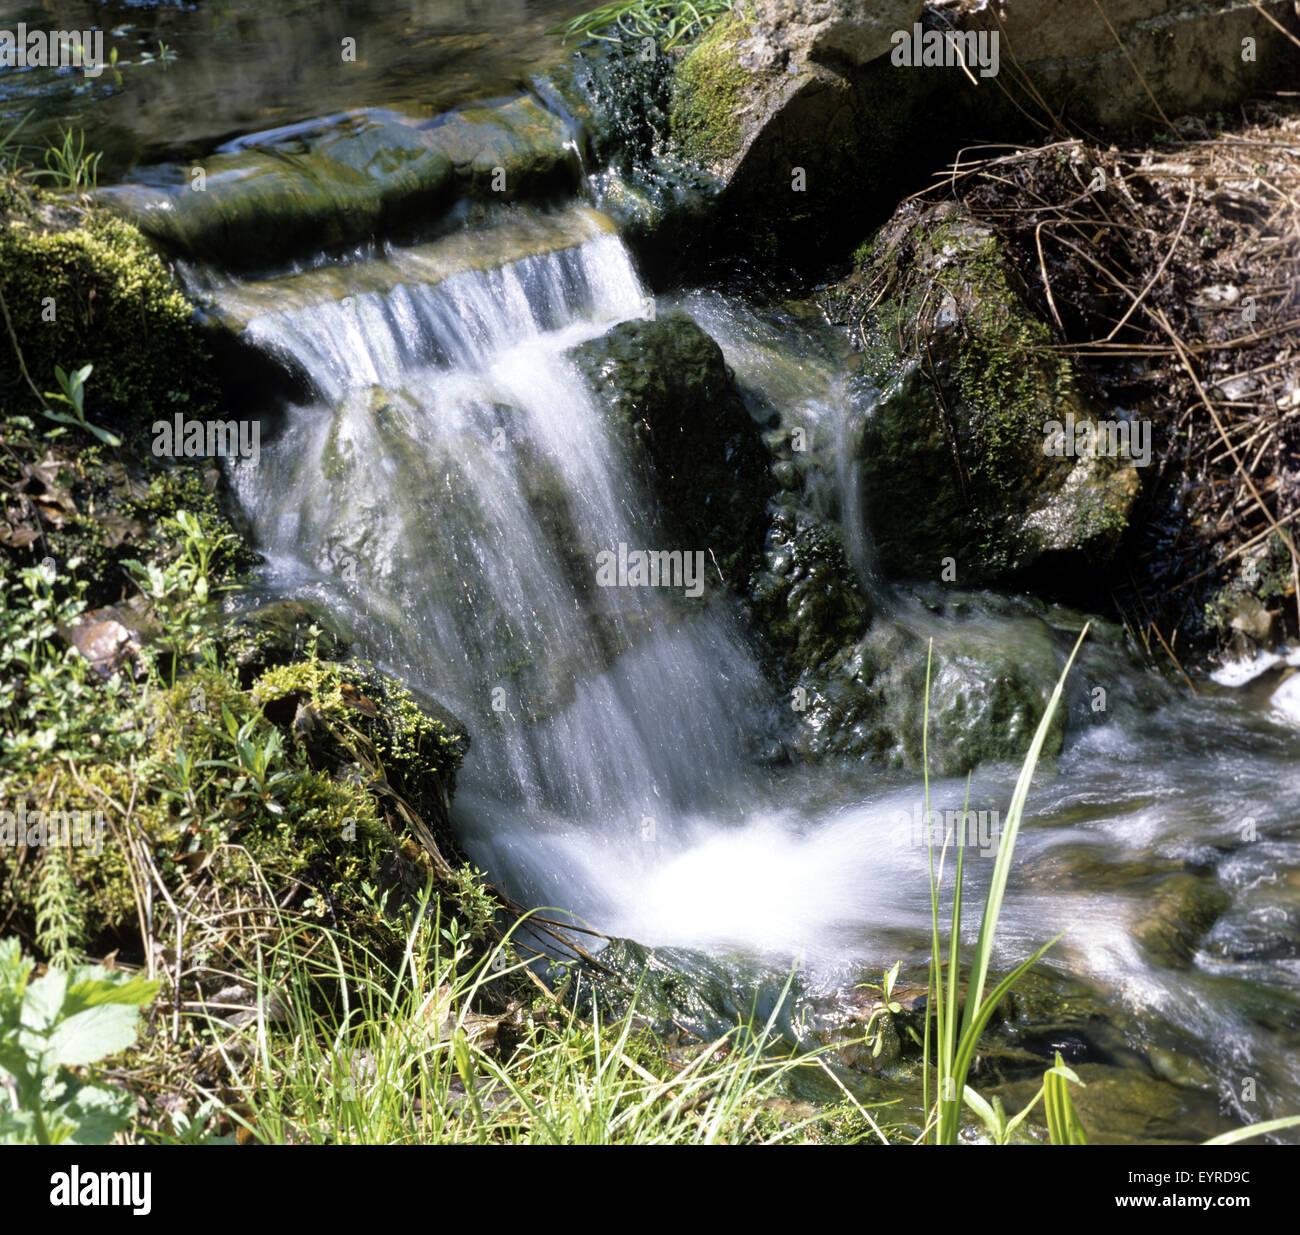 Bachlauf Garten Stock Photo 85952536 Alamy